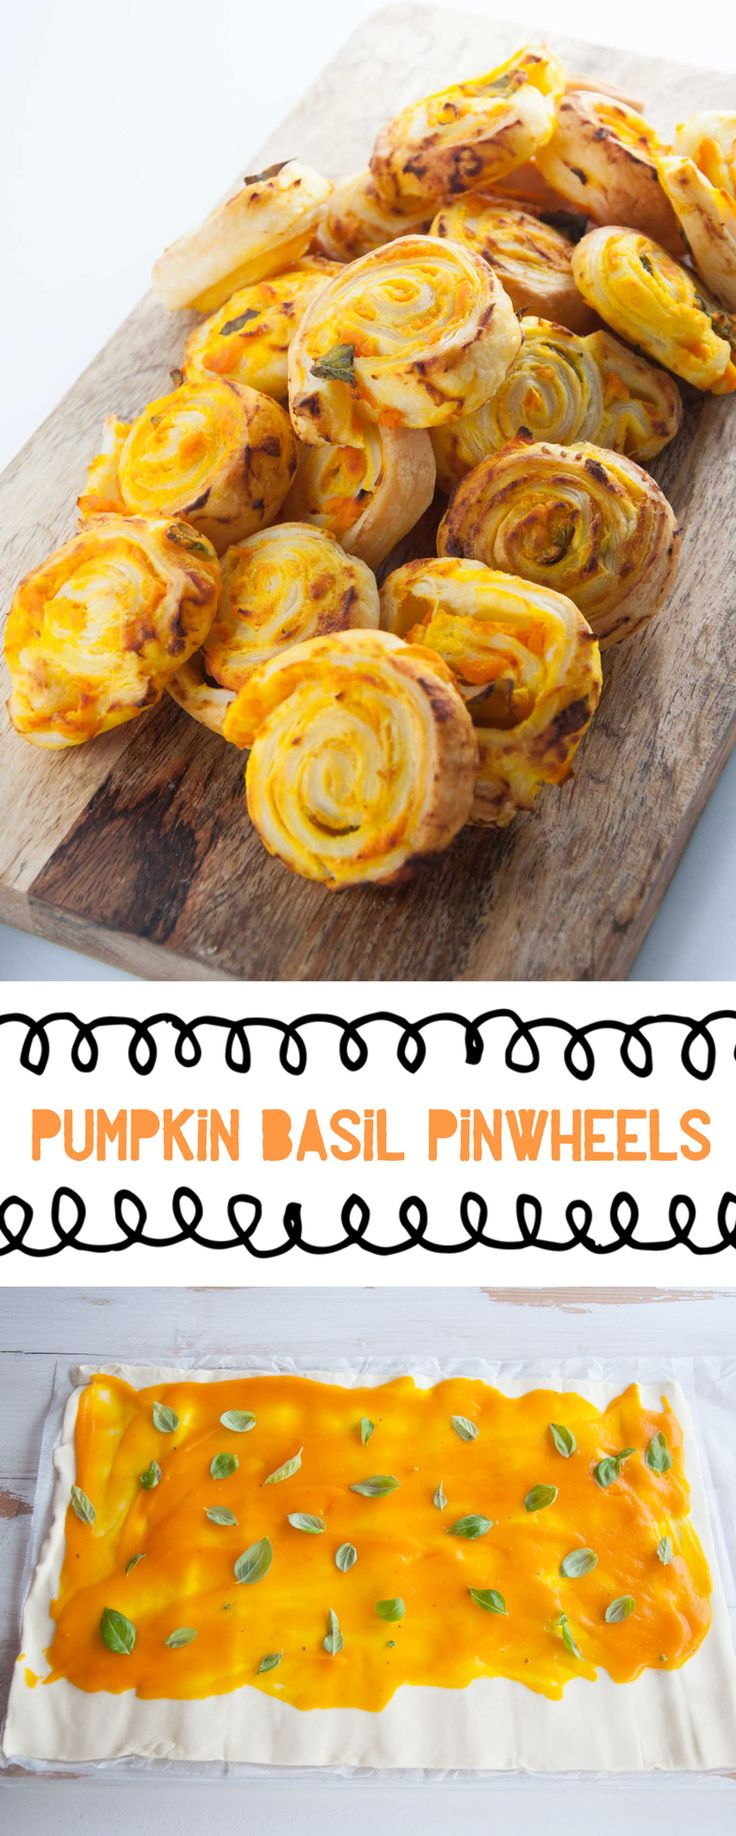 Vegan Pumpkin Basil Pinwheels #pumpkin #basil #pinwheels #vegan #snacks #partyfood | ElephantasticVegan.com